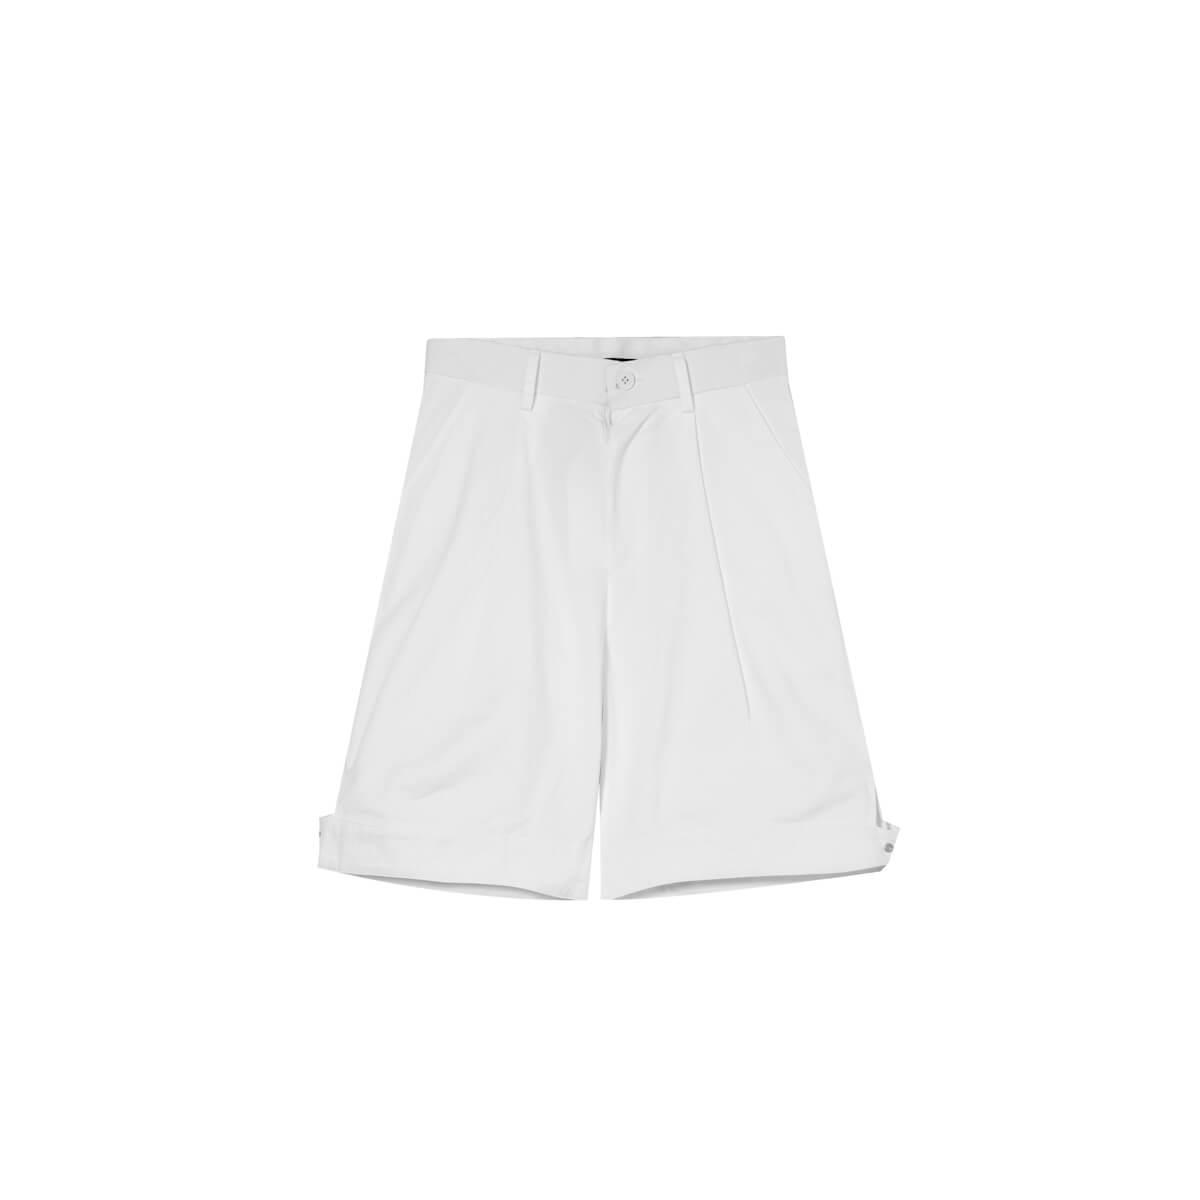 Шорты Cui Layout Studio Wide Leg Shorts White